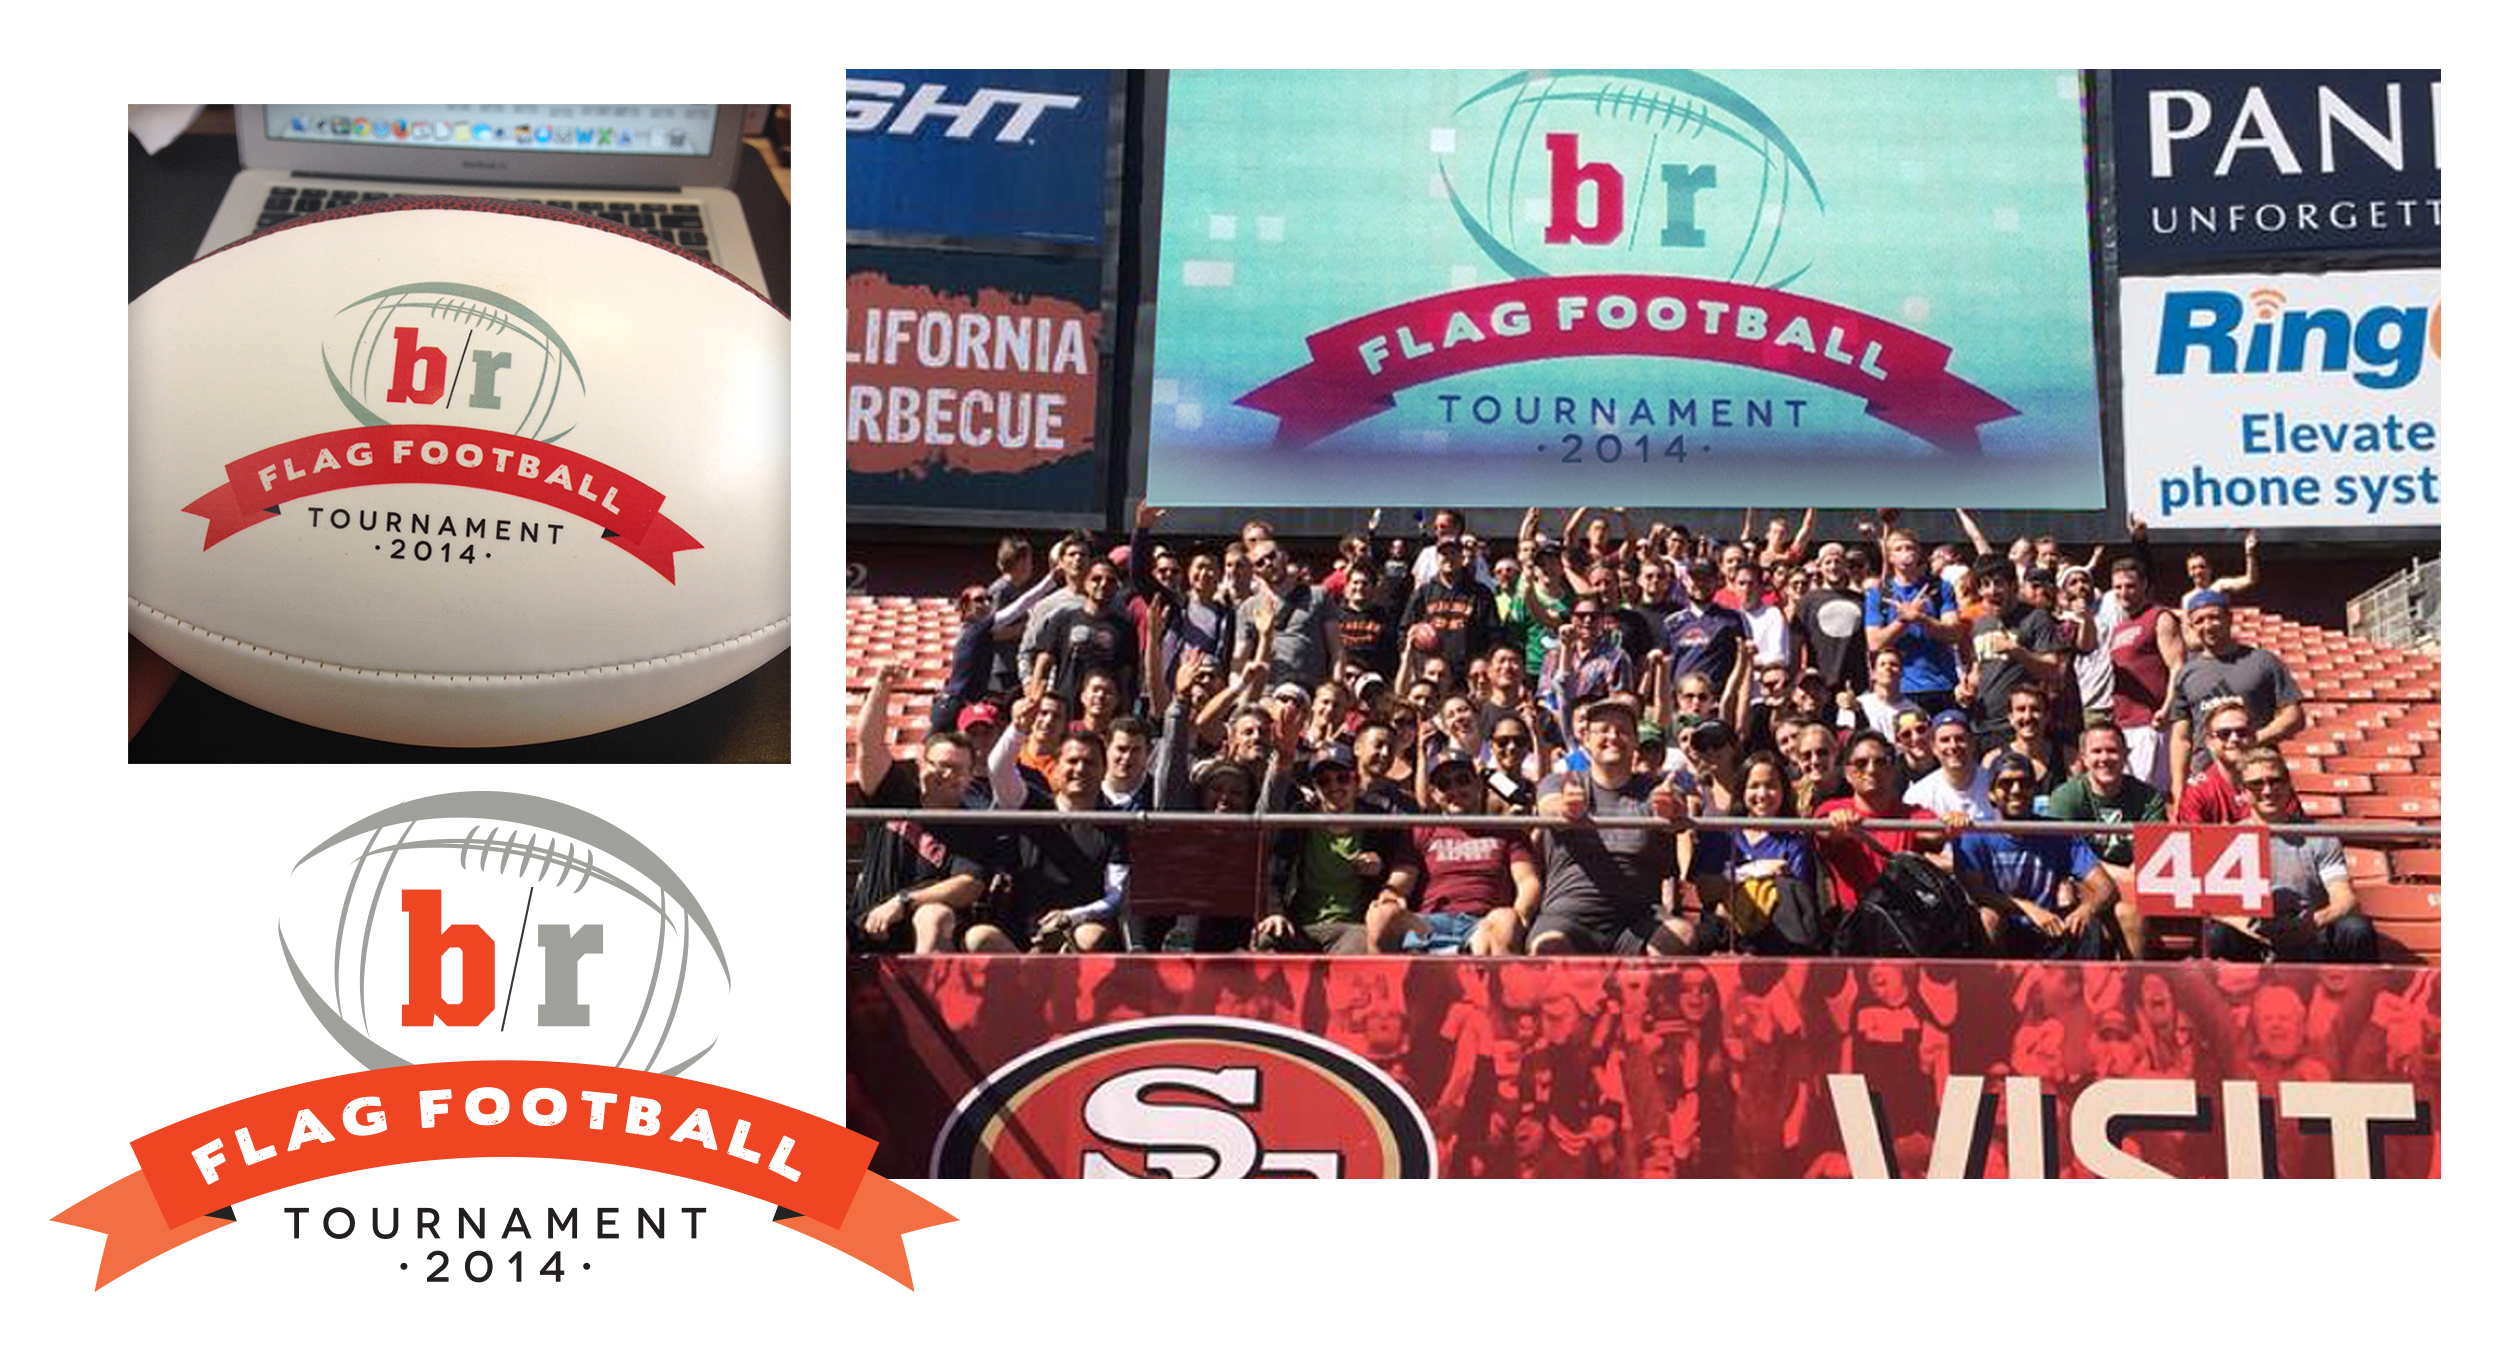 BR_FlagFootball_Tournament_2014.jpg